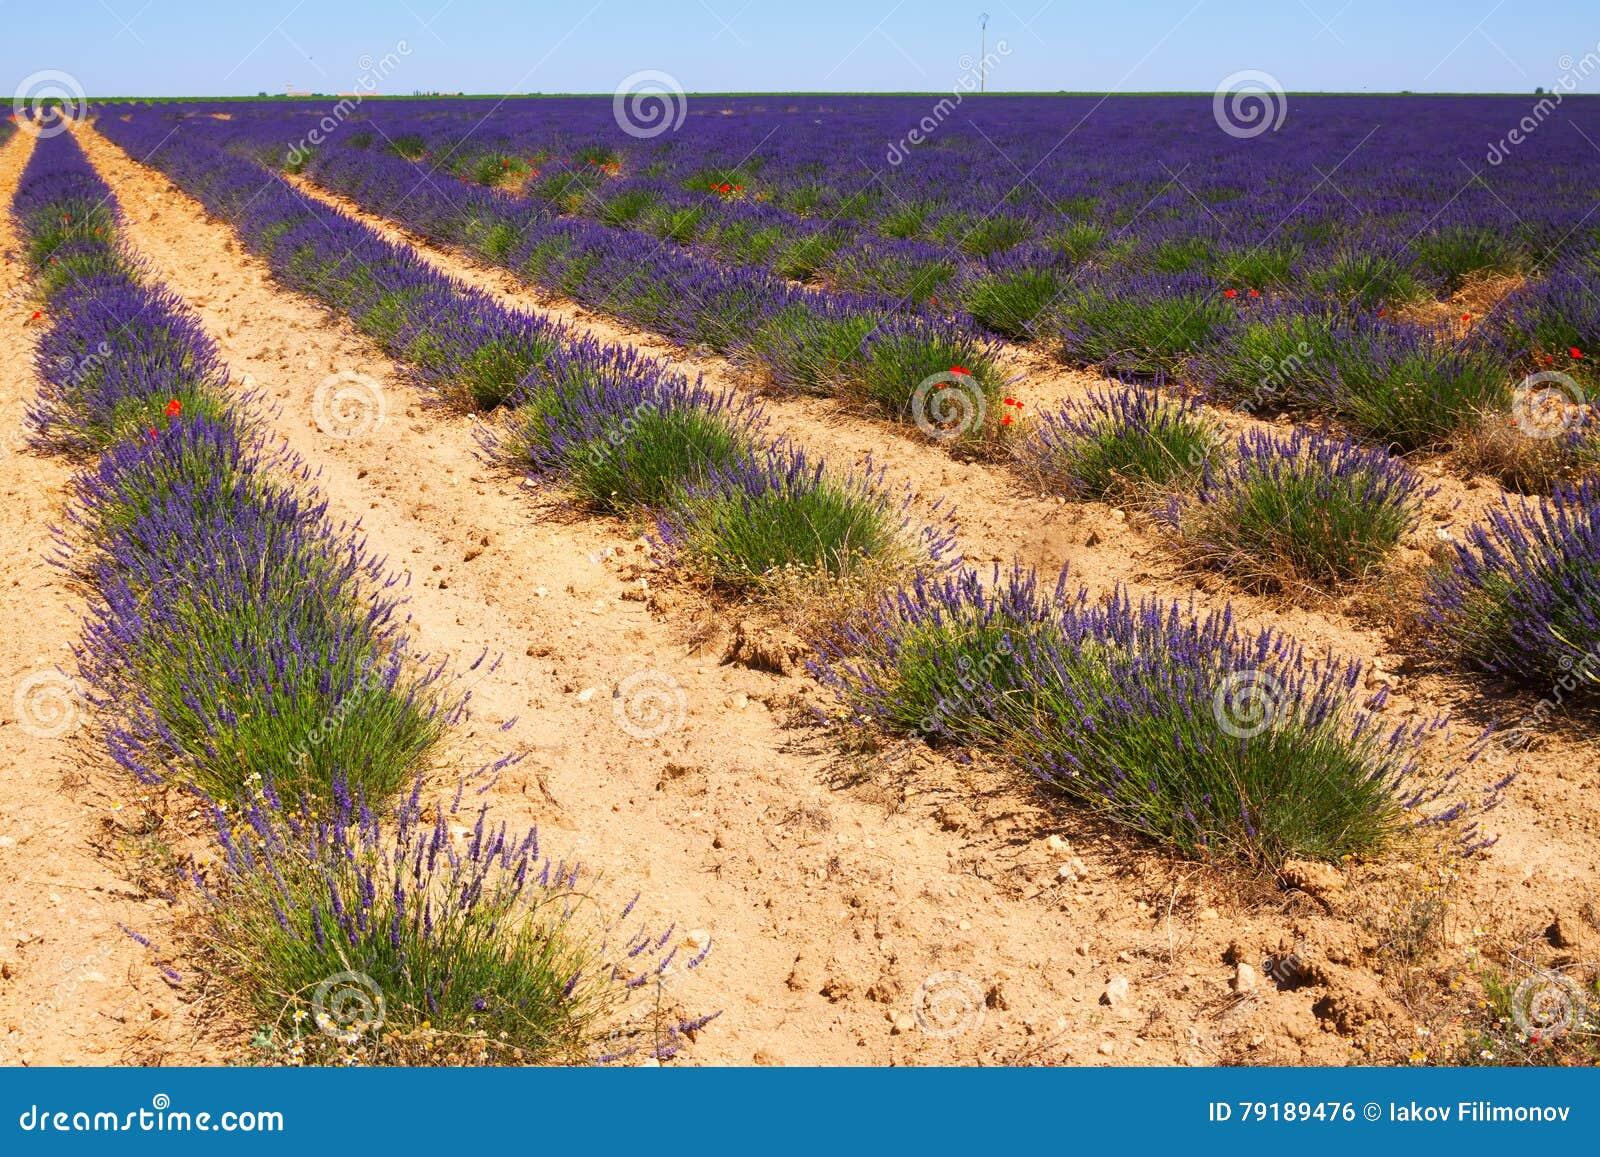 Landscape with plant of lavender